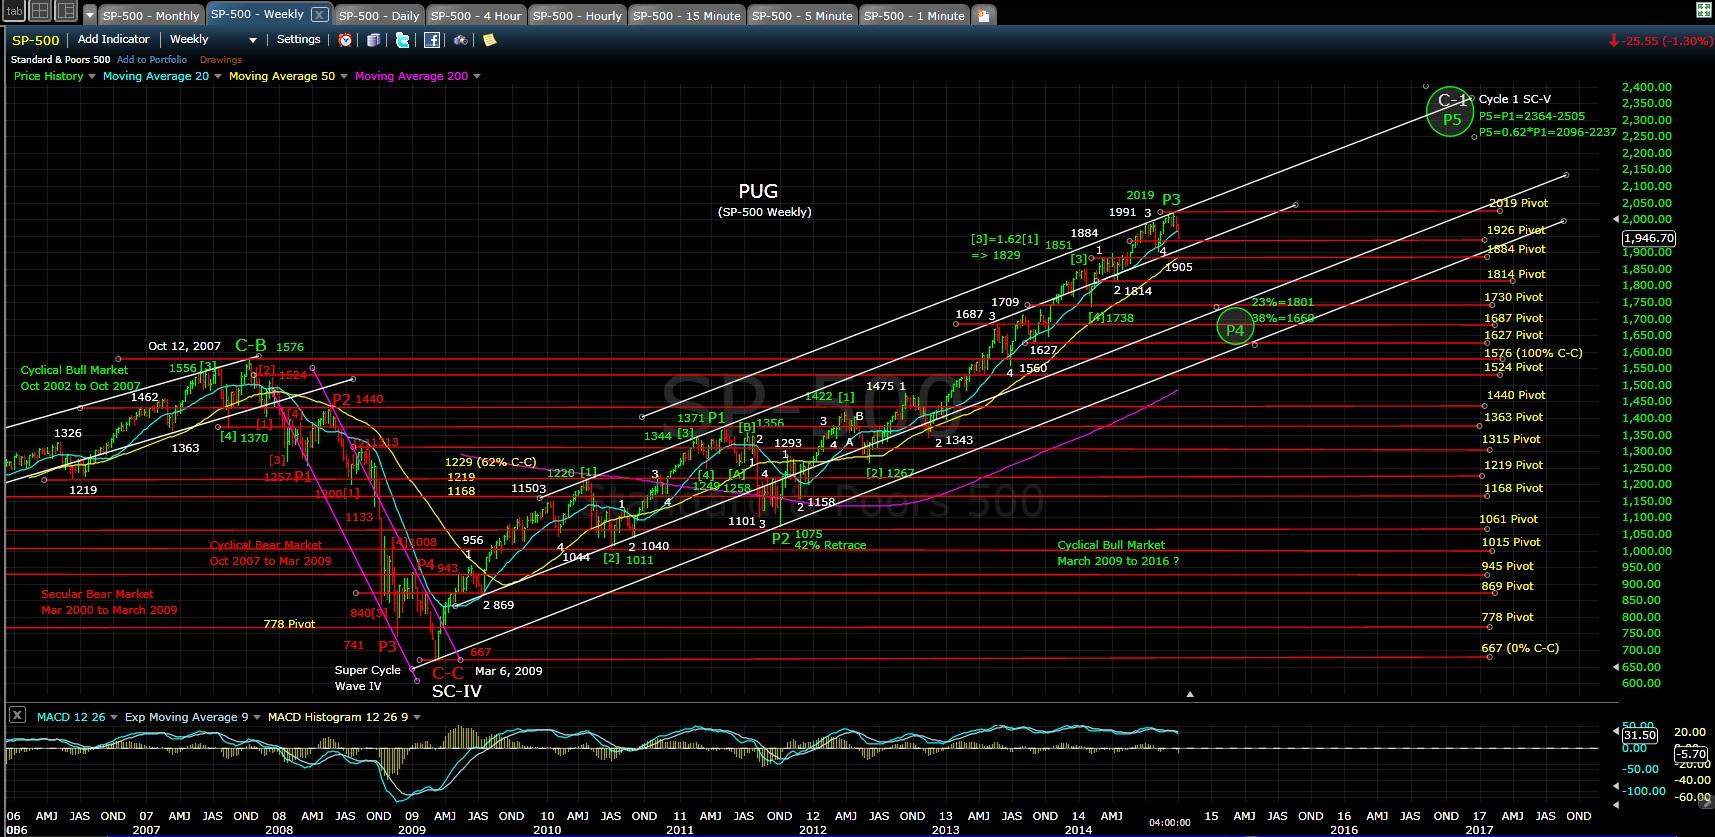 PUG SP-500 weekly chart EOD 10-1-14